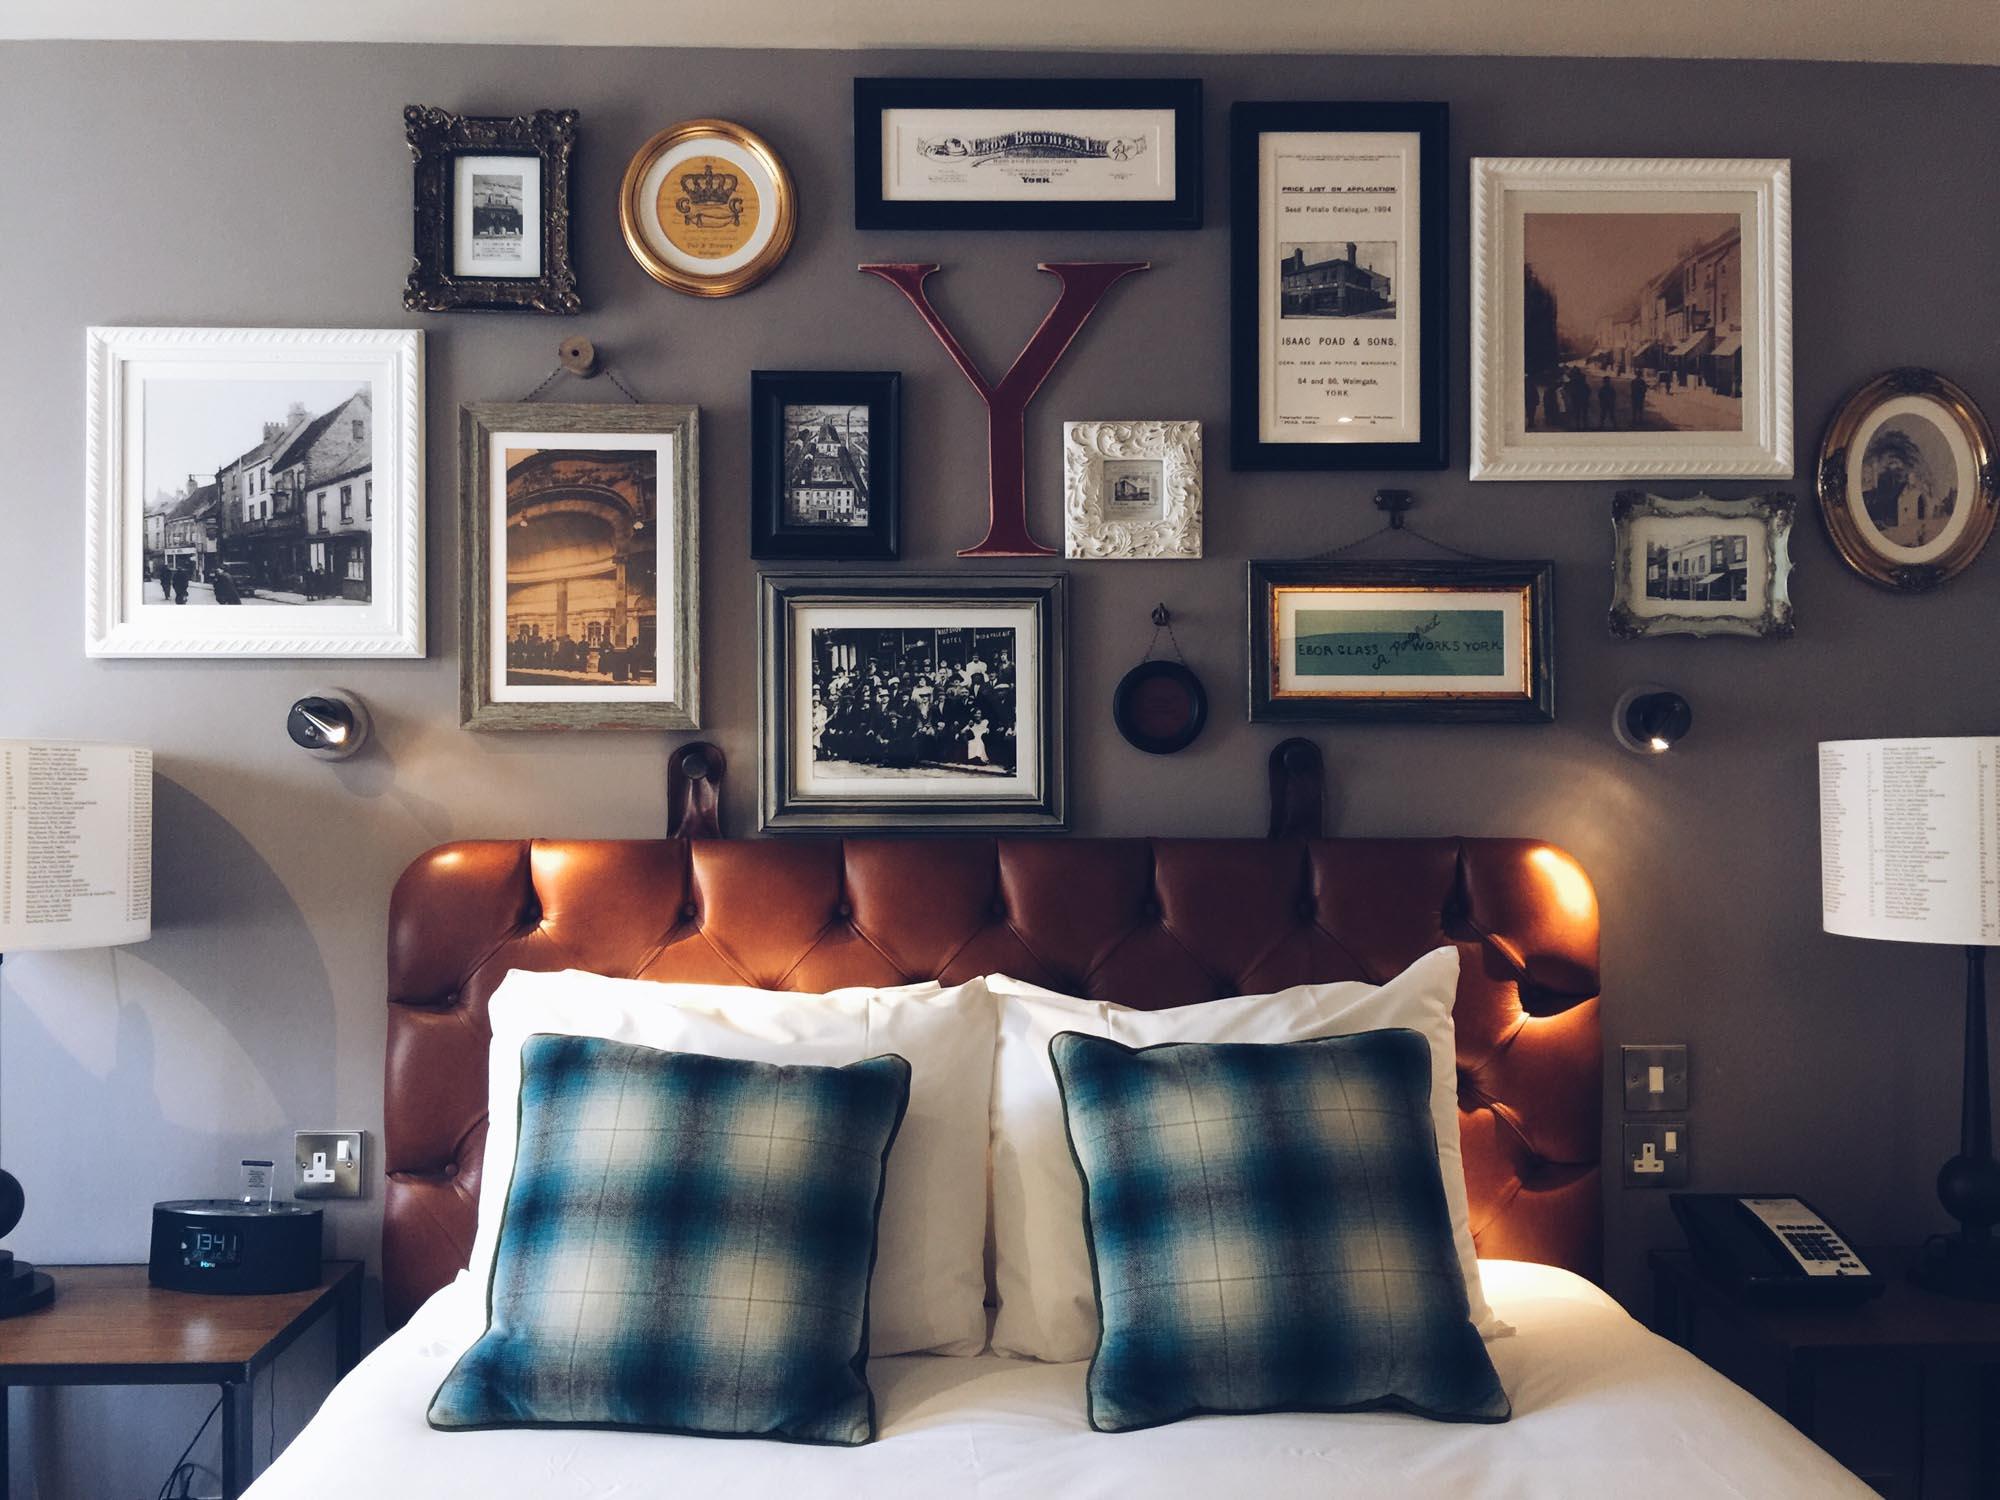 Best things to do in York - Indigo Hotel